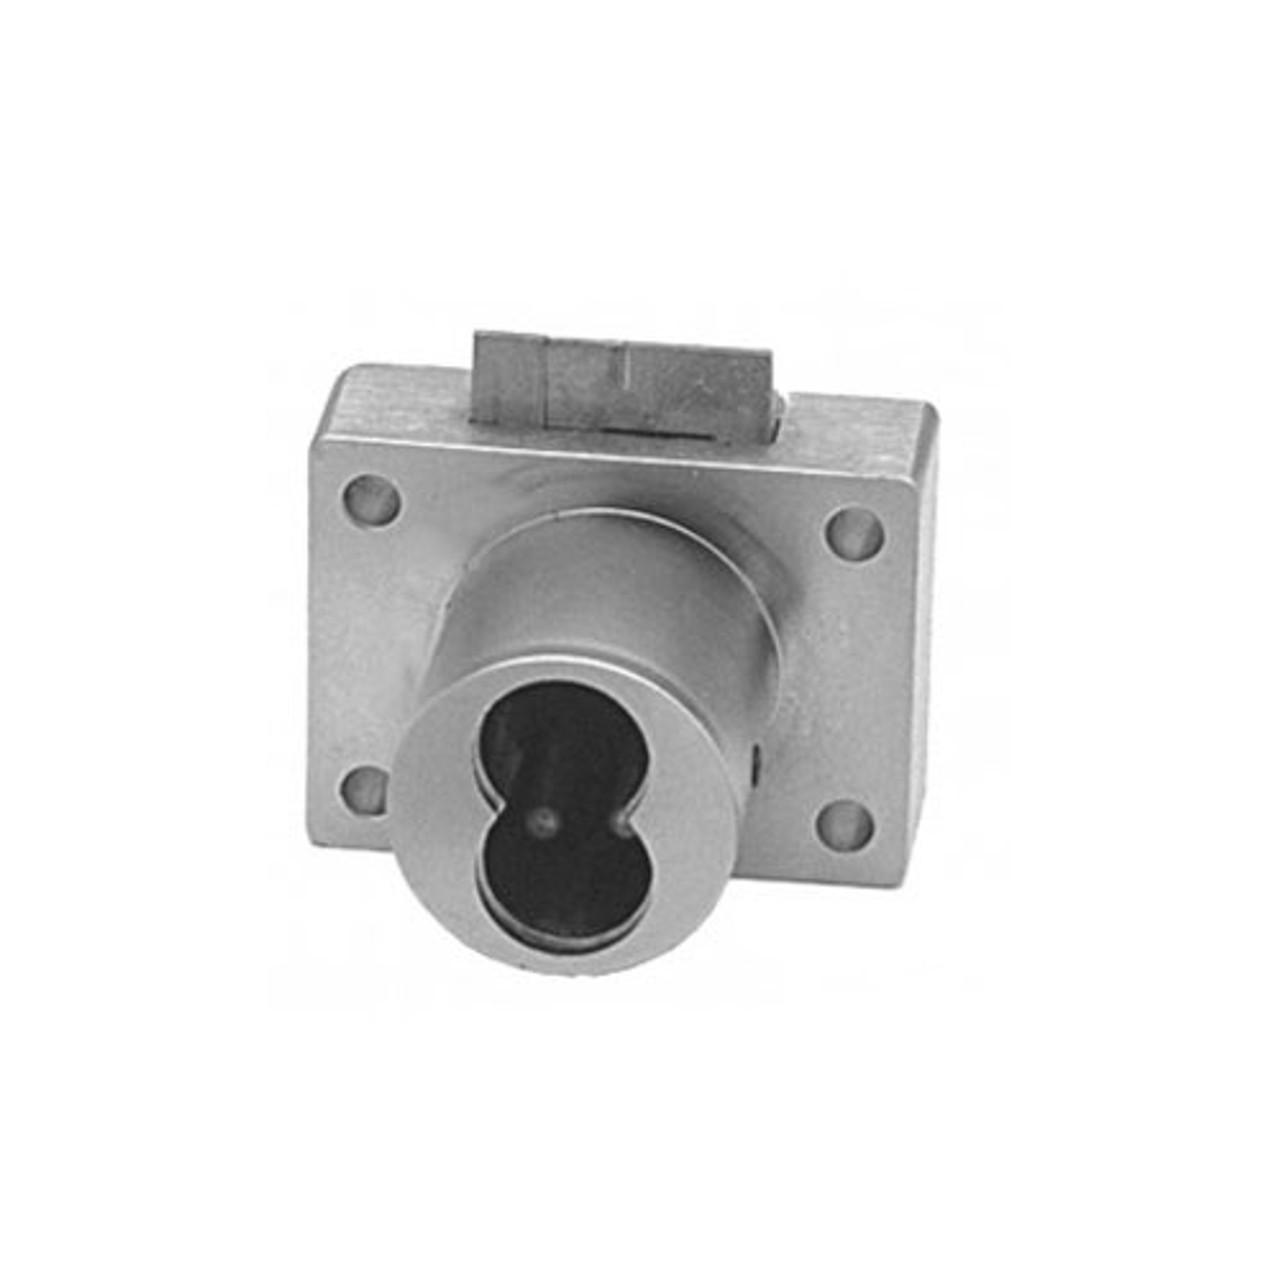 Olympus 950IC-26D Cabinet Locks in Satin Chrome Finish